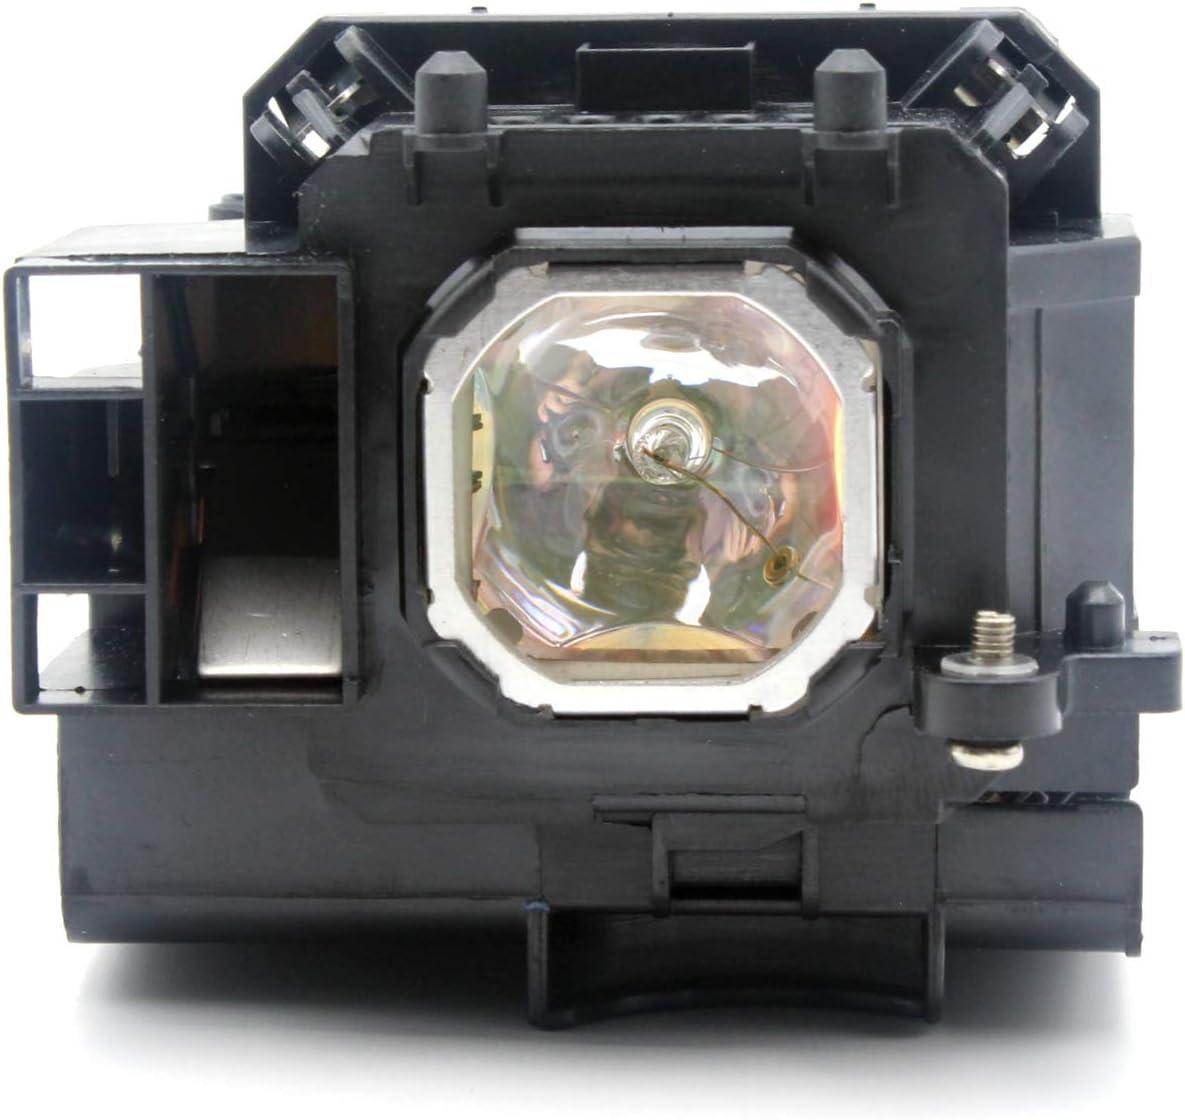 Emazne NP17LP Projector Replacement Compatible Lamp with Housing Work for NEC:M300WS NEC:M350XS NEC:M420X M420XM M420XV MP420XG MP420XVG NP-M300WS NP-M300WSJL P350WG P420XG UM-300X UM300W UM330W